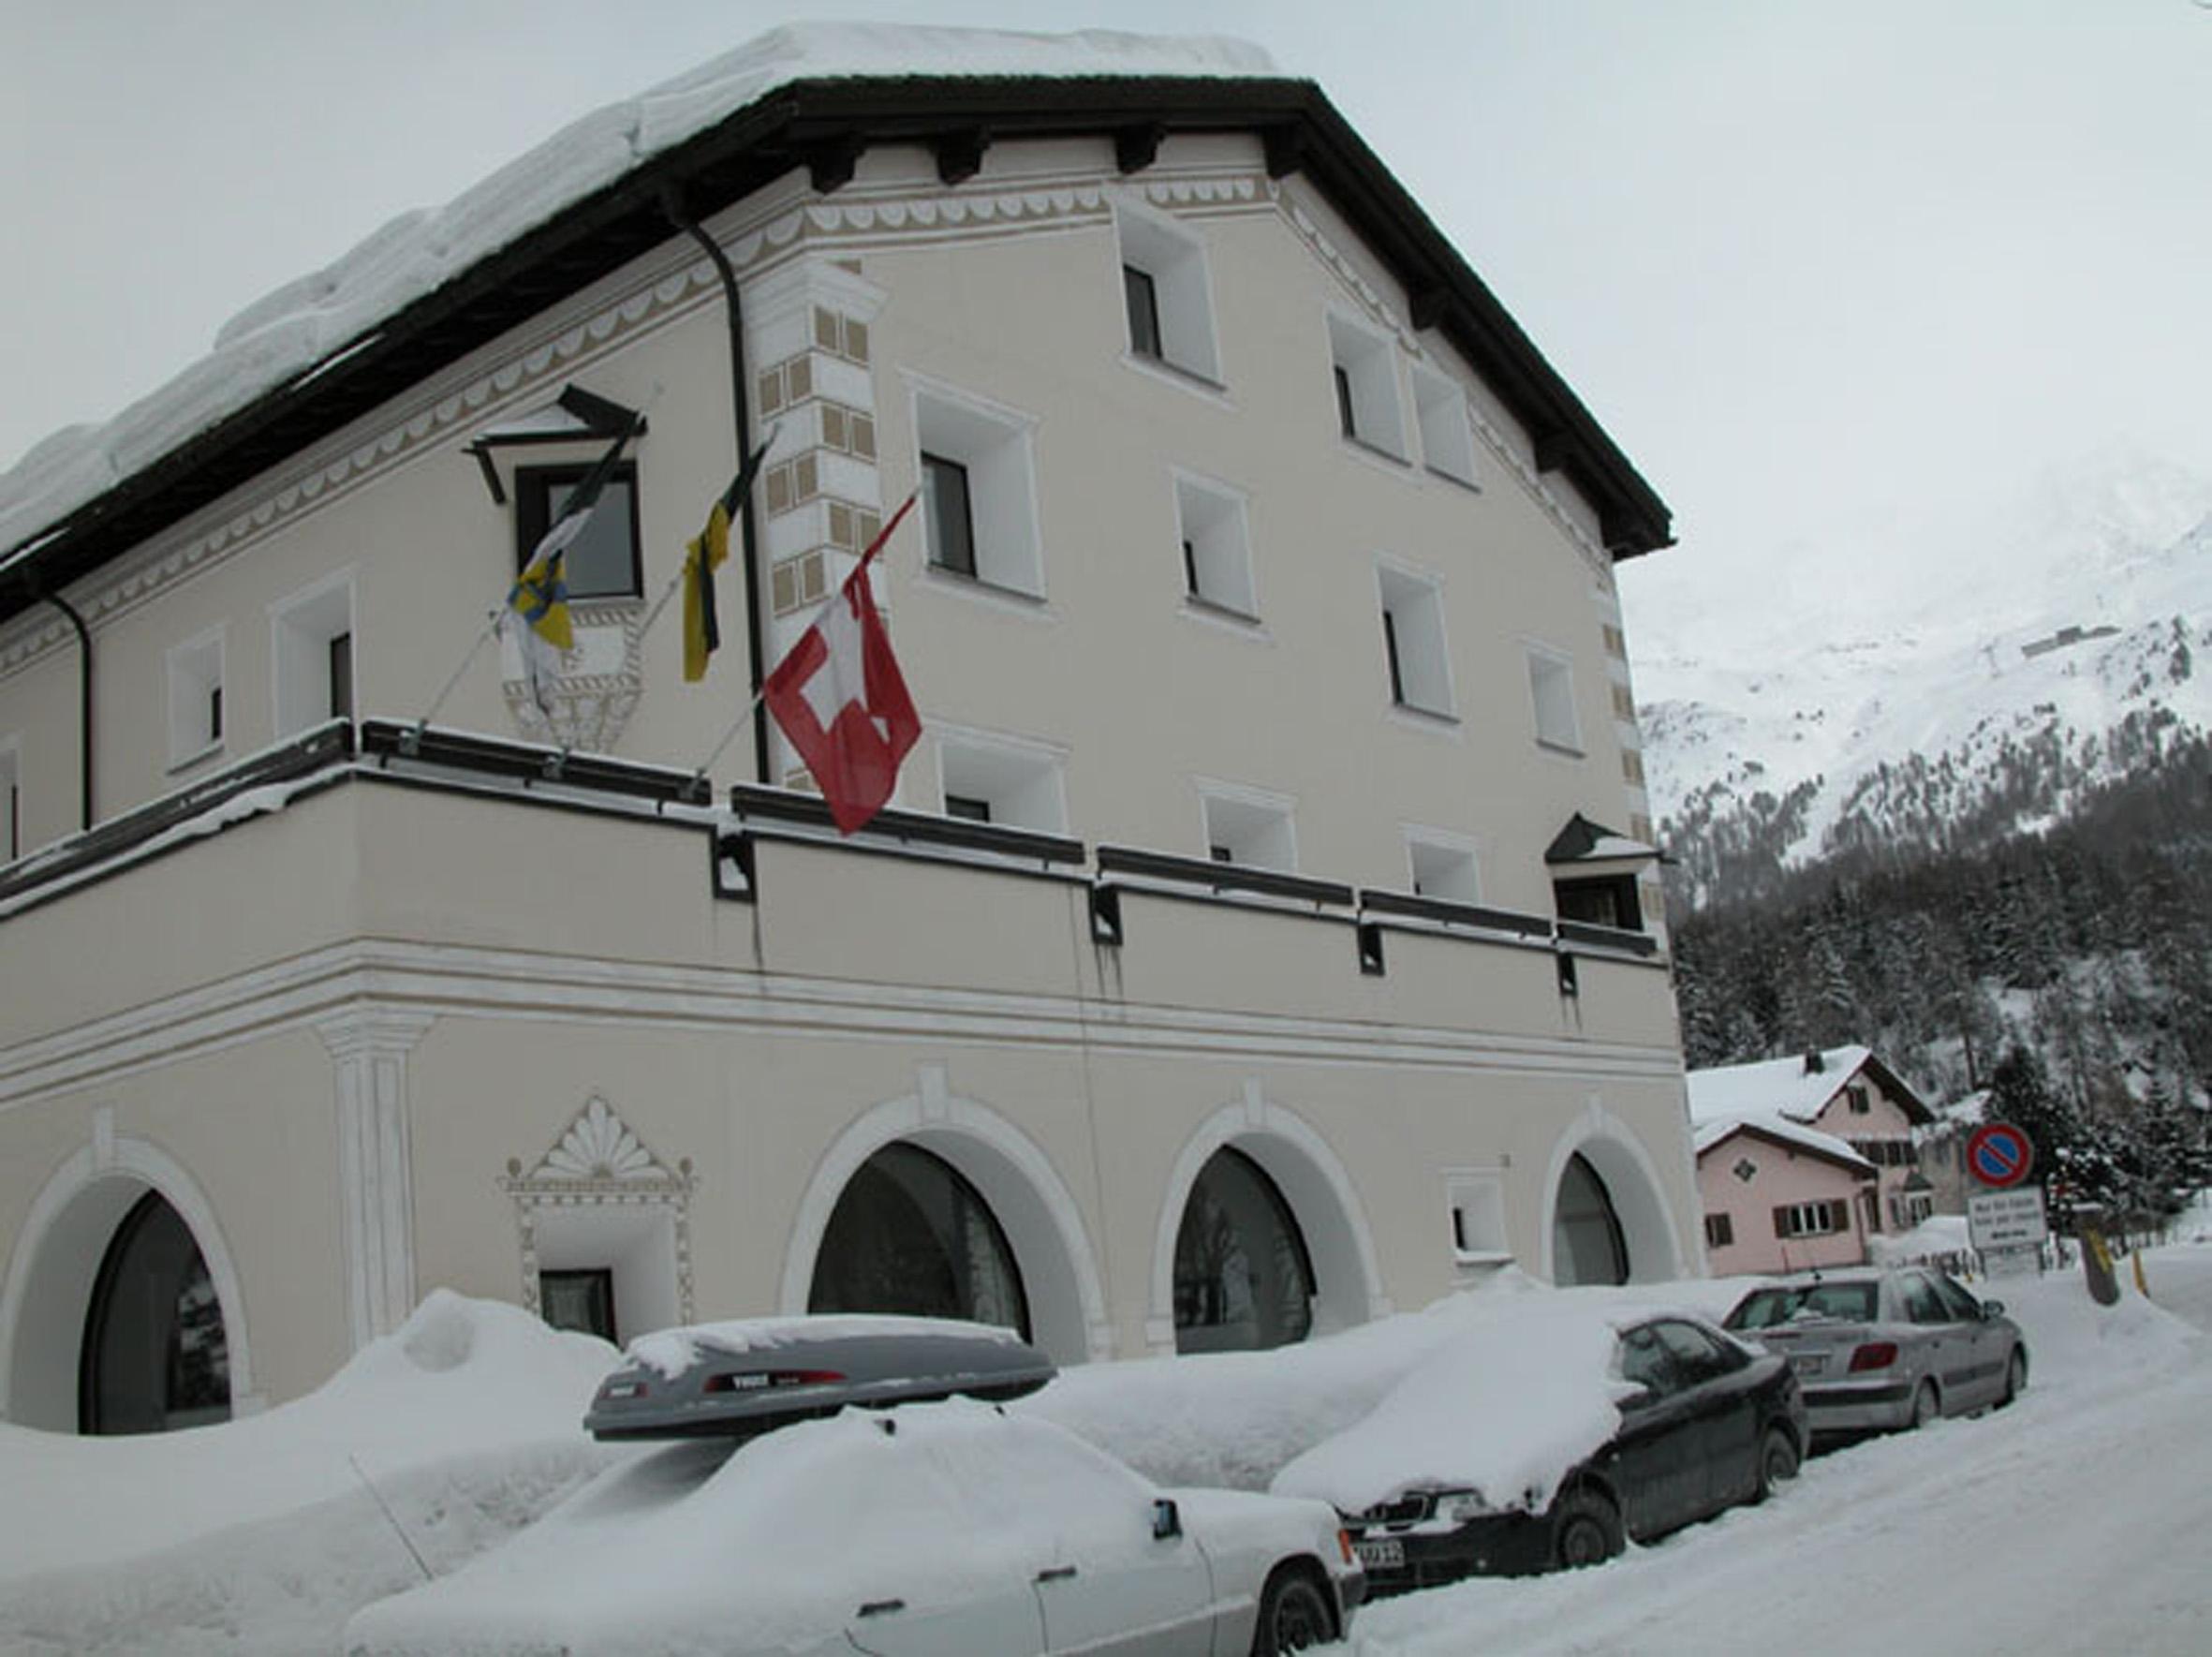 Hotel Silserhof